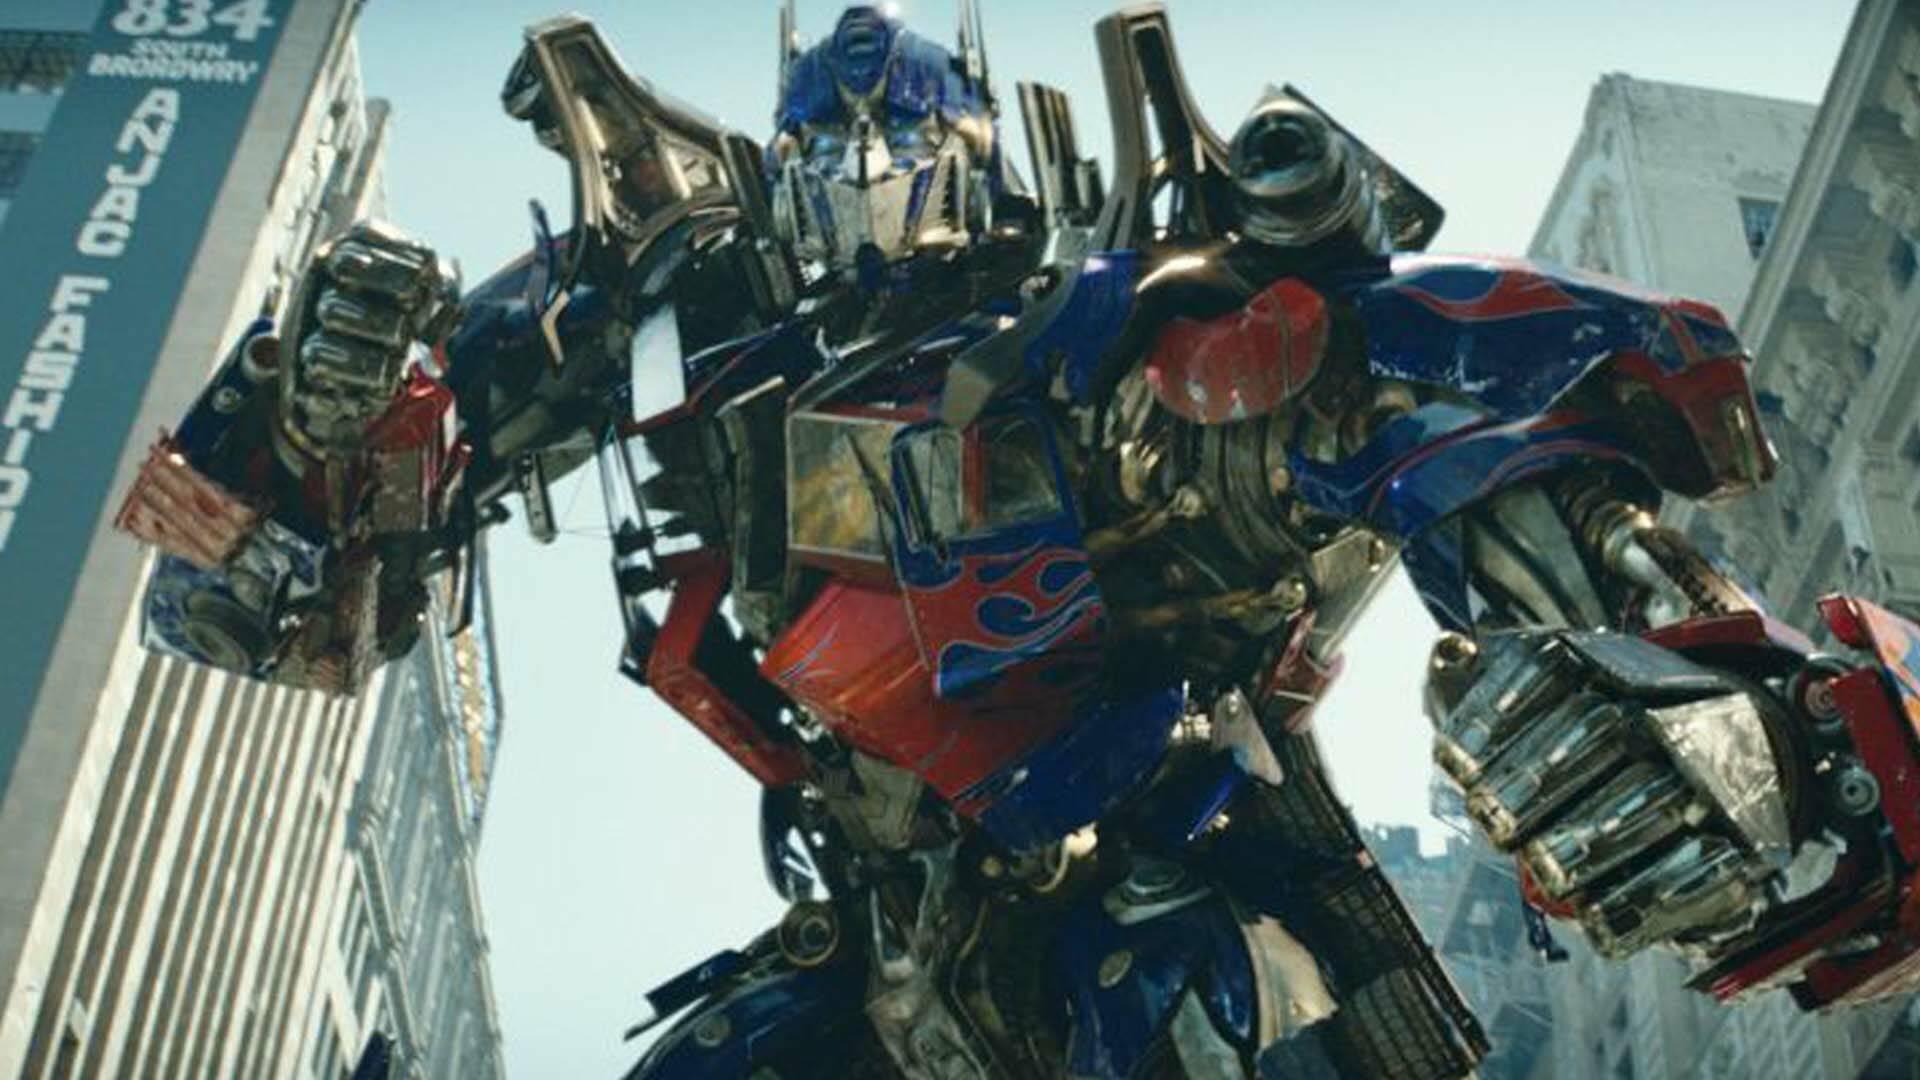 Transformers Film